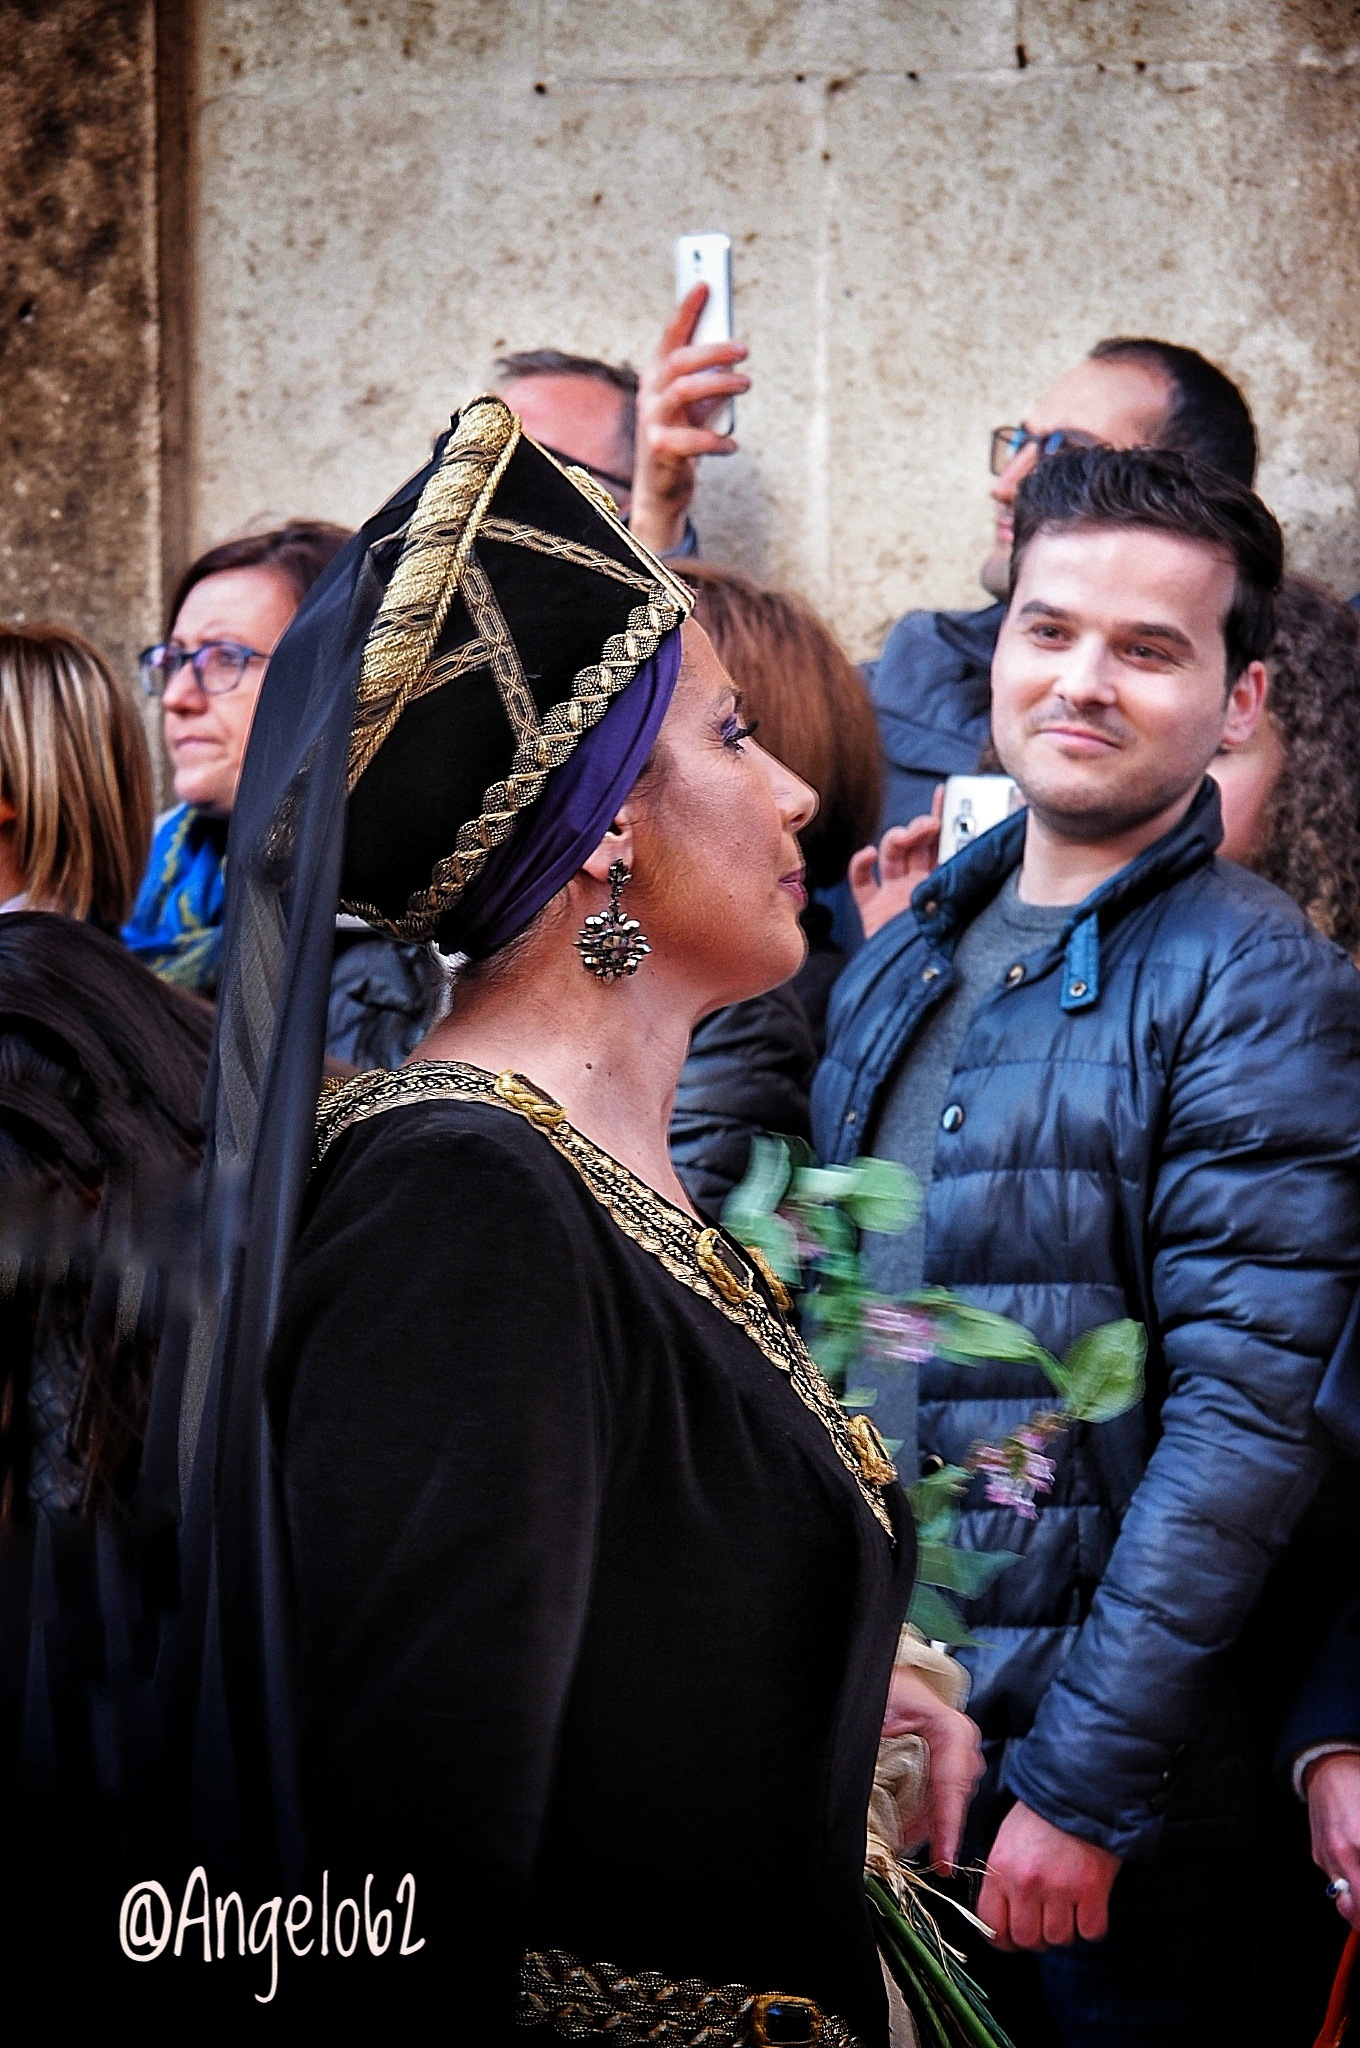 Federicus - festa medievale di Altamura  by Angelo62